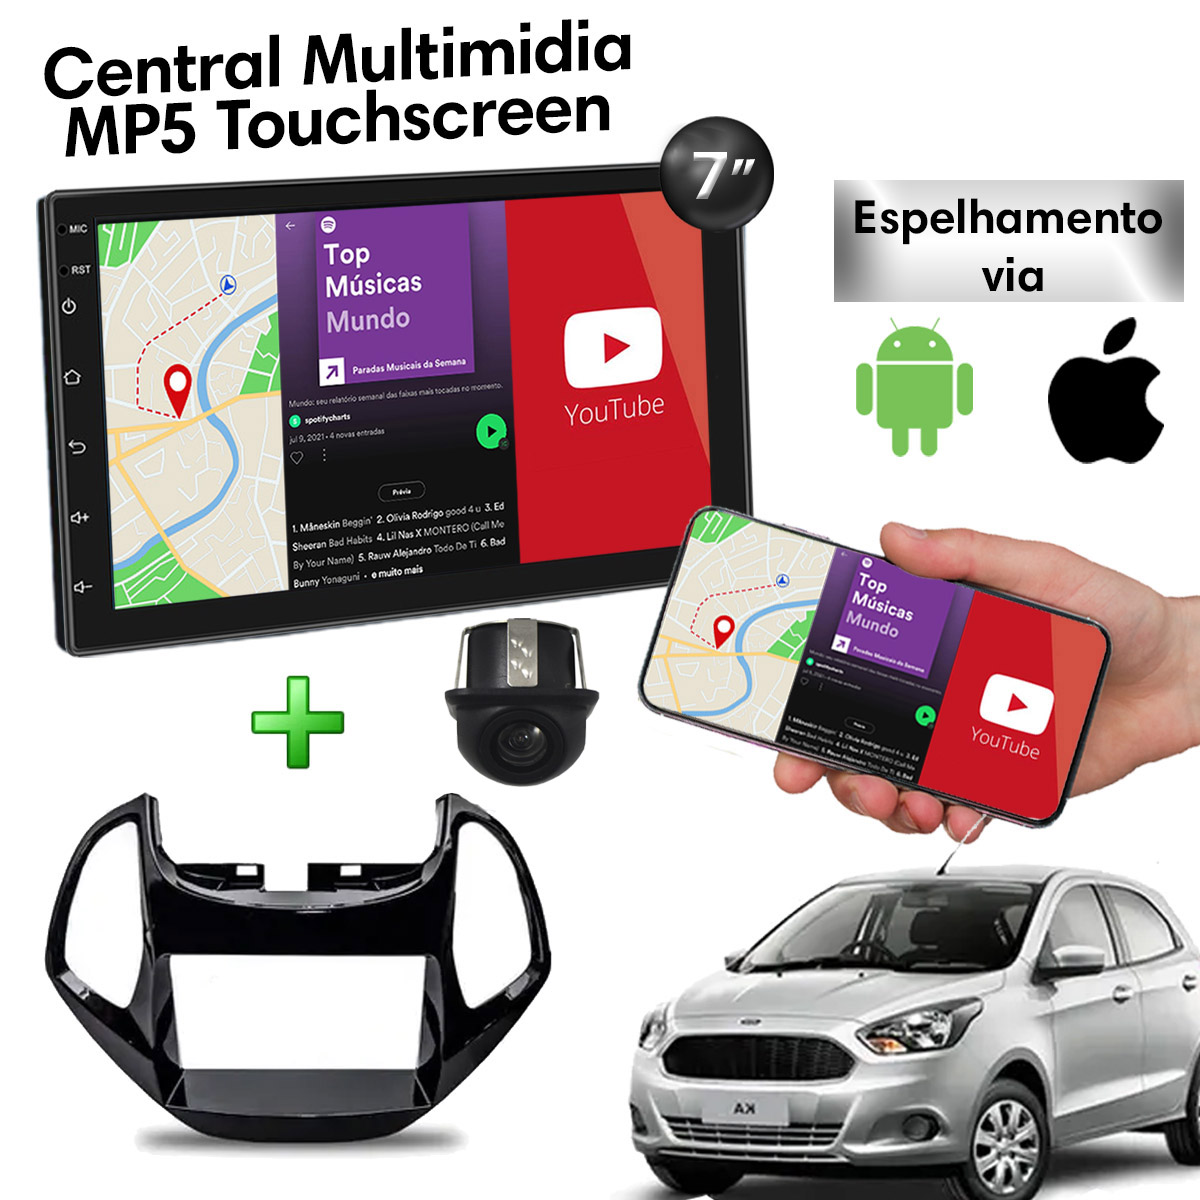 Central Multimidia com Moldura Ford Novo Ka Mp5 Bluetooth Usb Touchscreen 7 Polegadas 2 Din Black Piano Poliparts